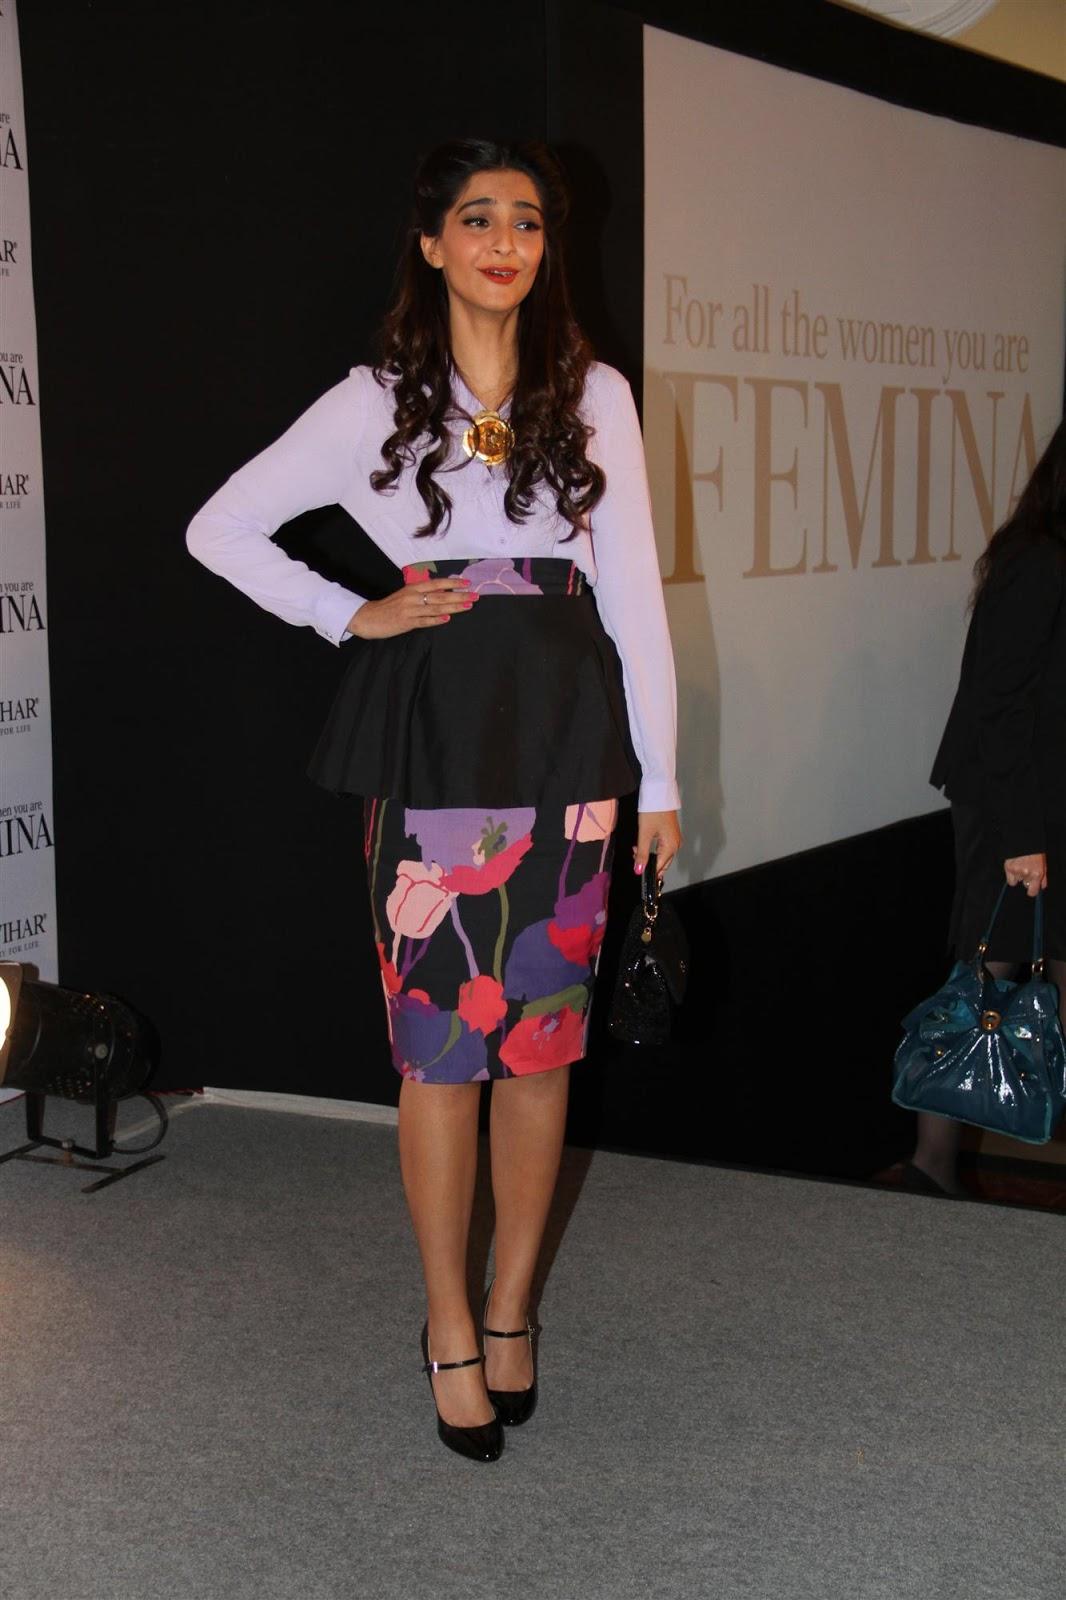 Sonam Kapoor Looks Classy At The Launch Of Loreal Femina -2423